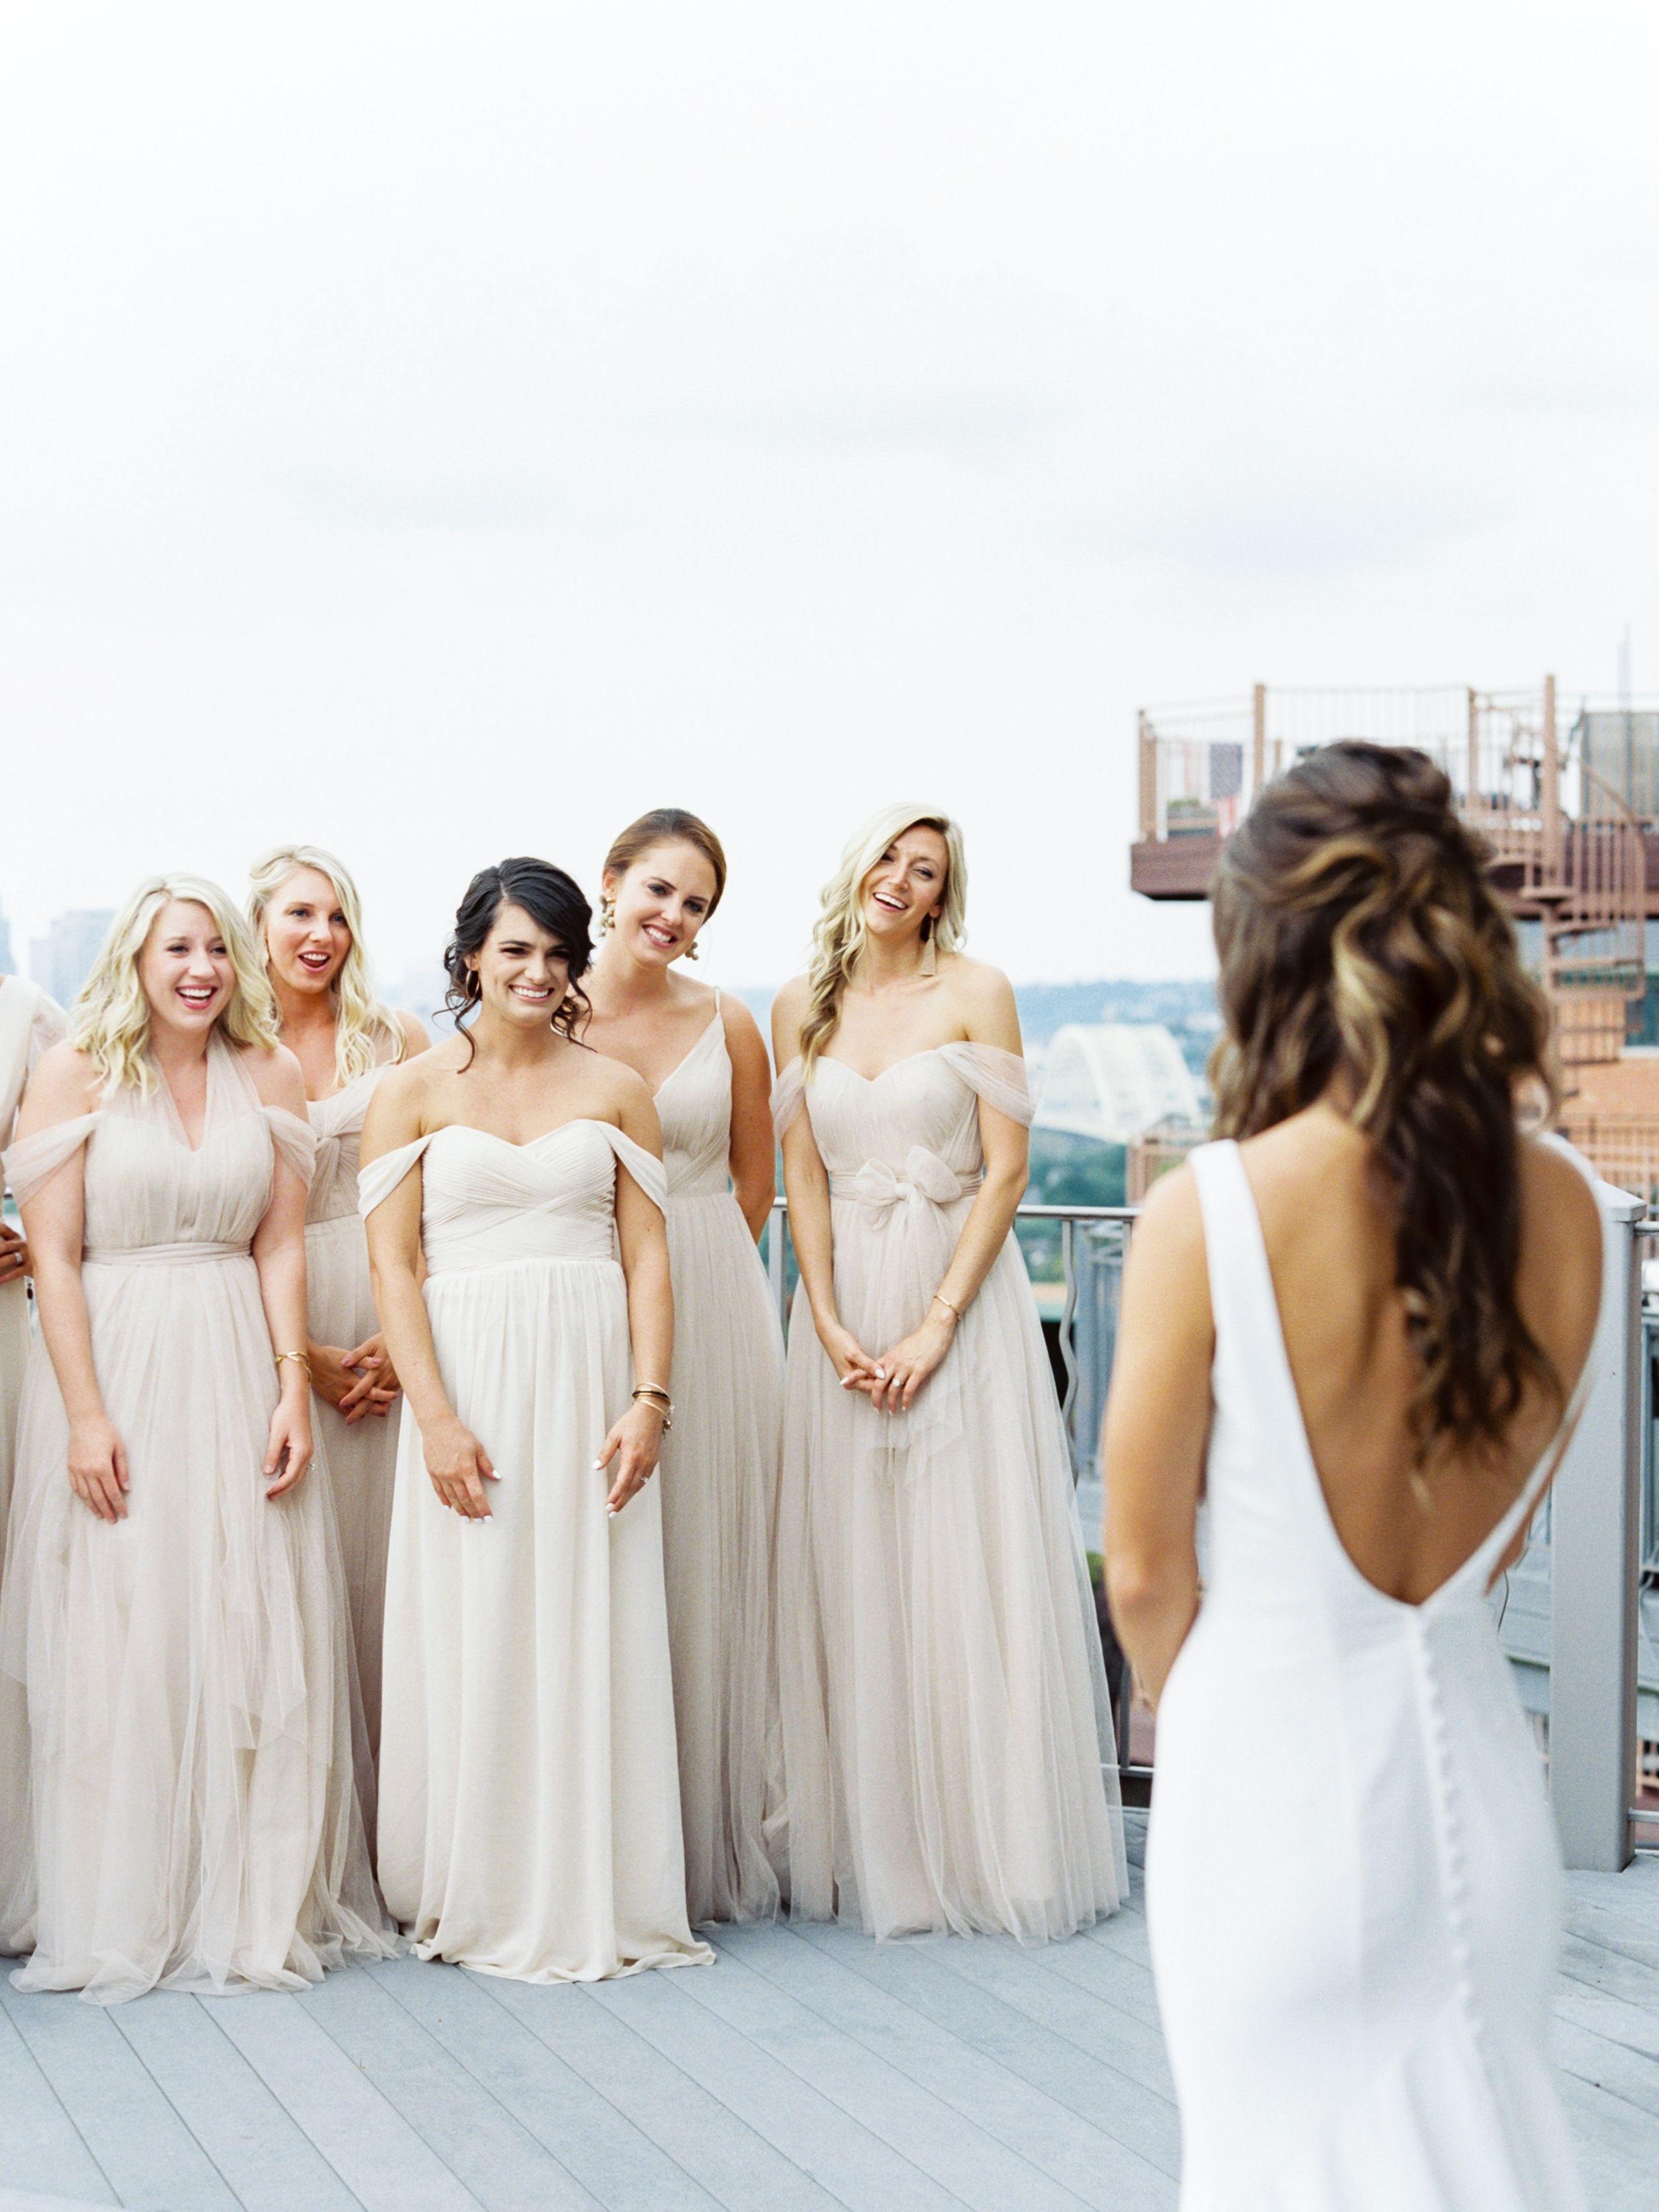 Pin On Bridesmaid Style